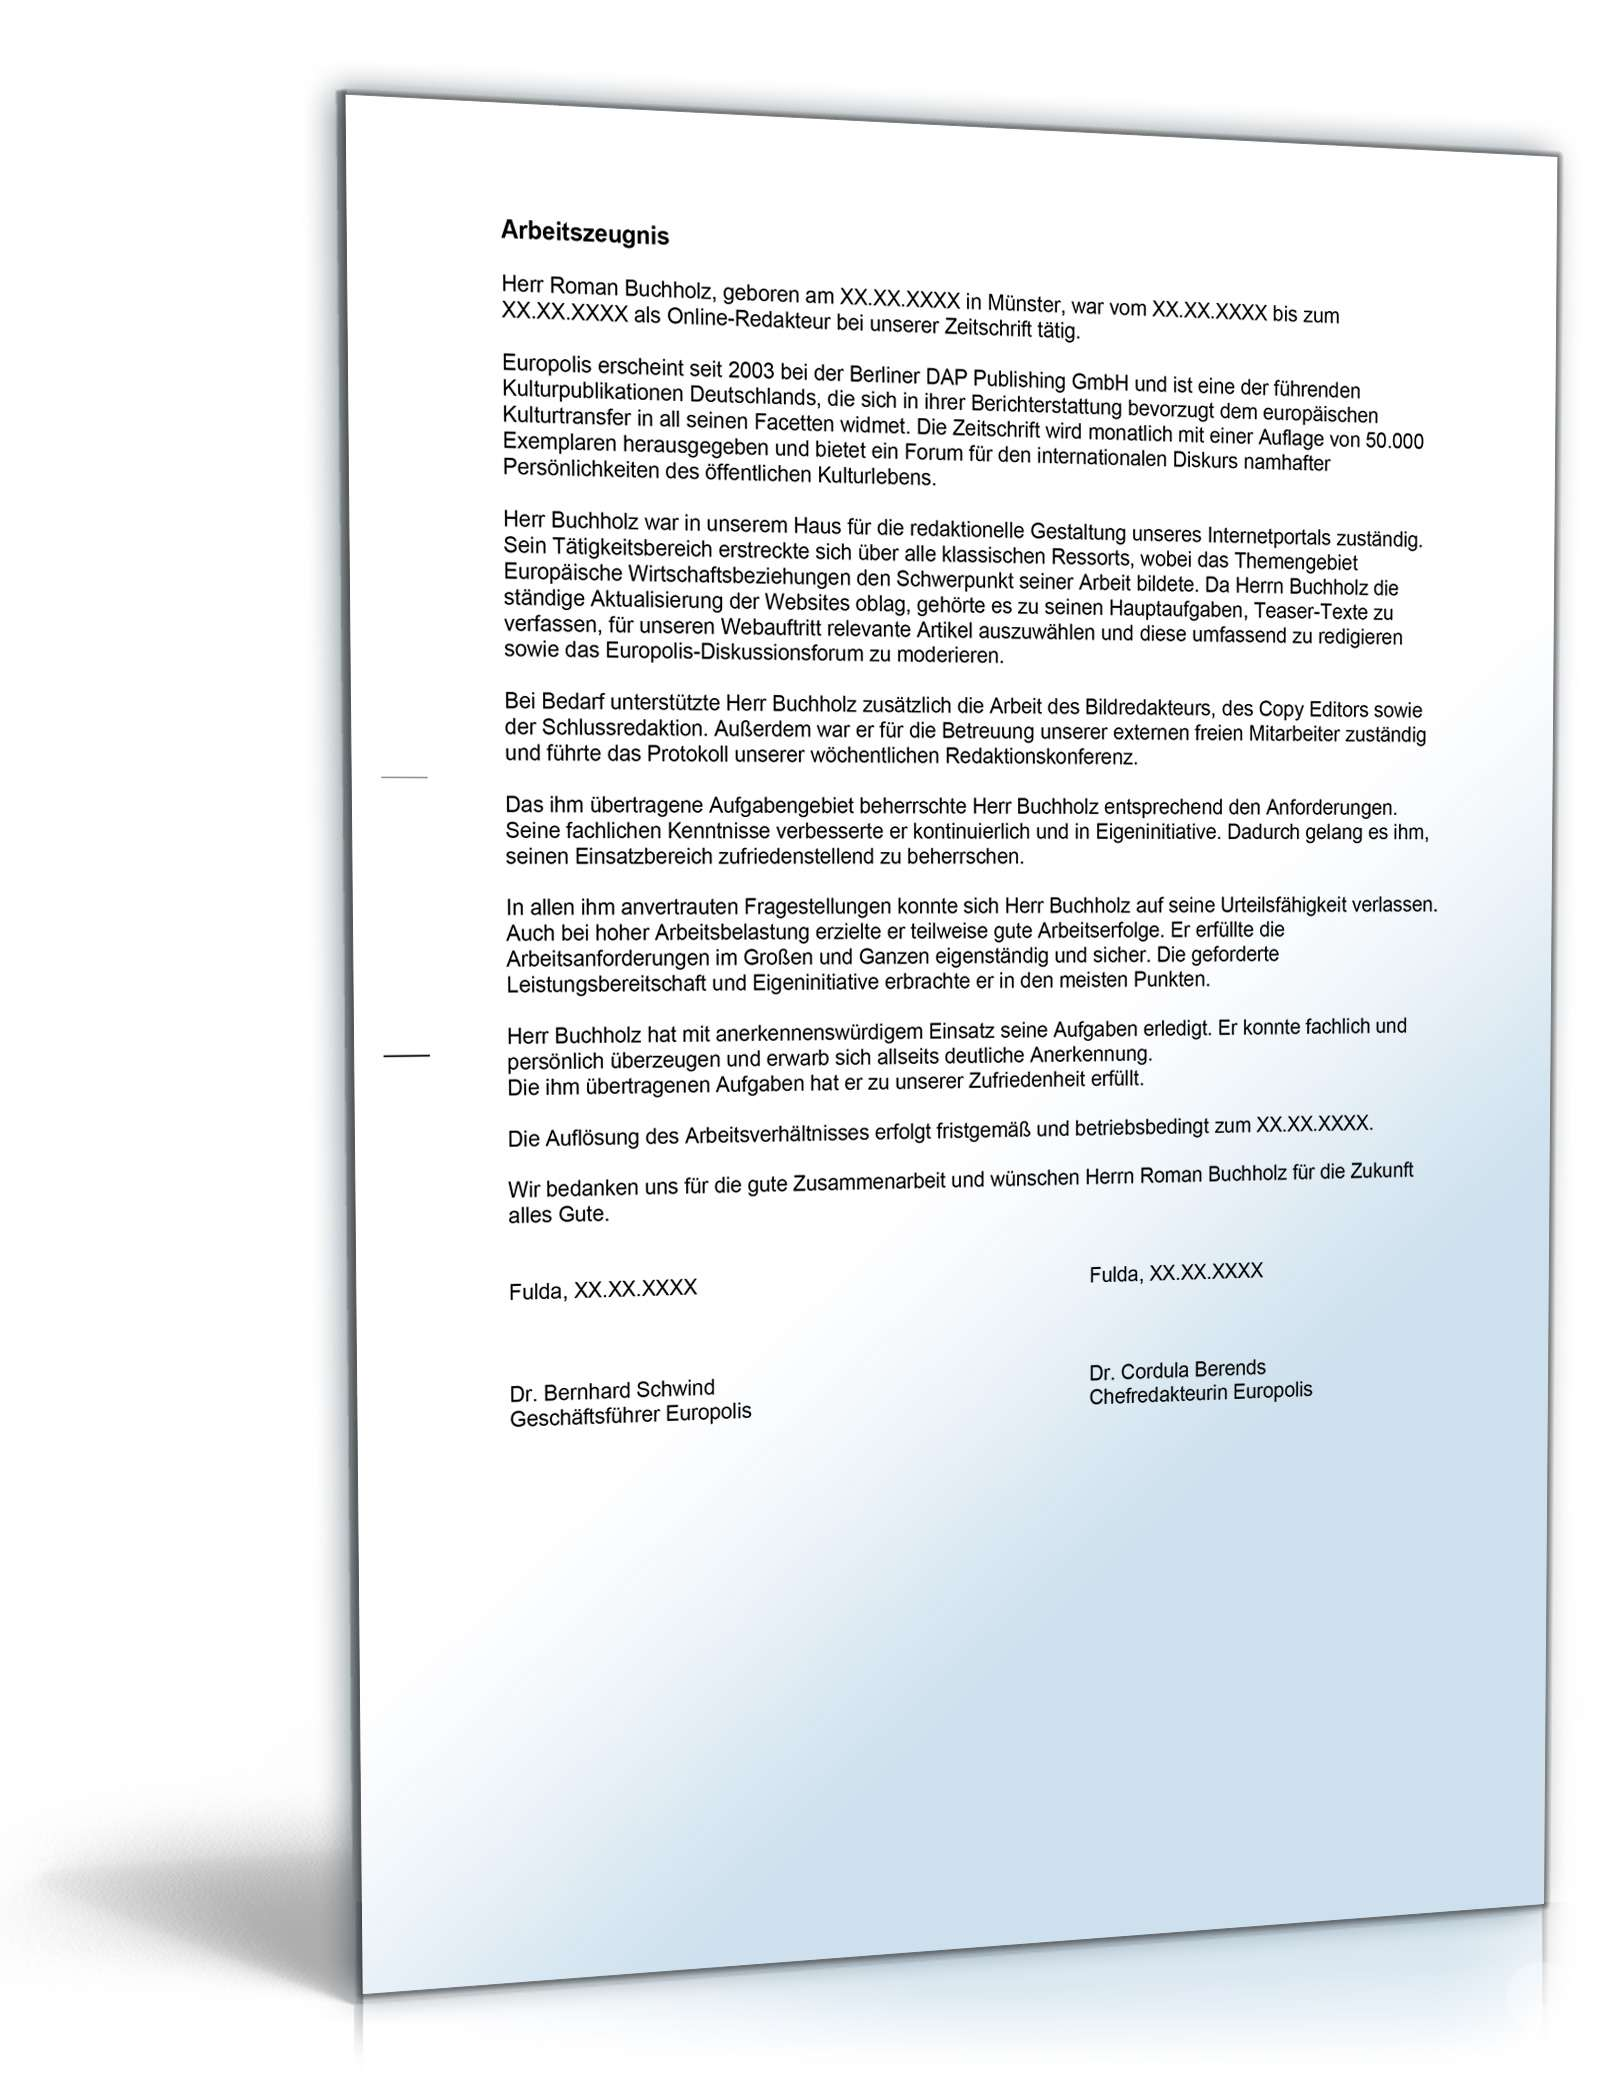 Berühmt Monatliche Projektberichtvorlage Ideen - Entry Level Resume ...